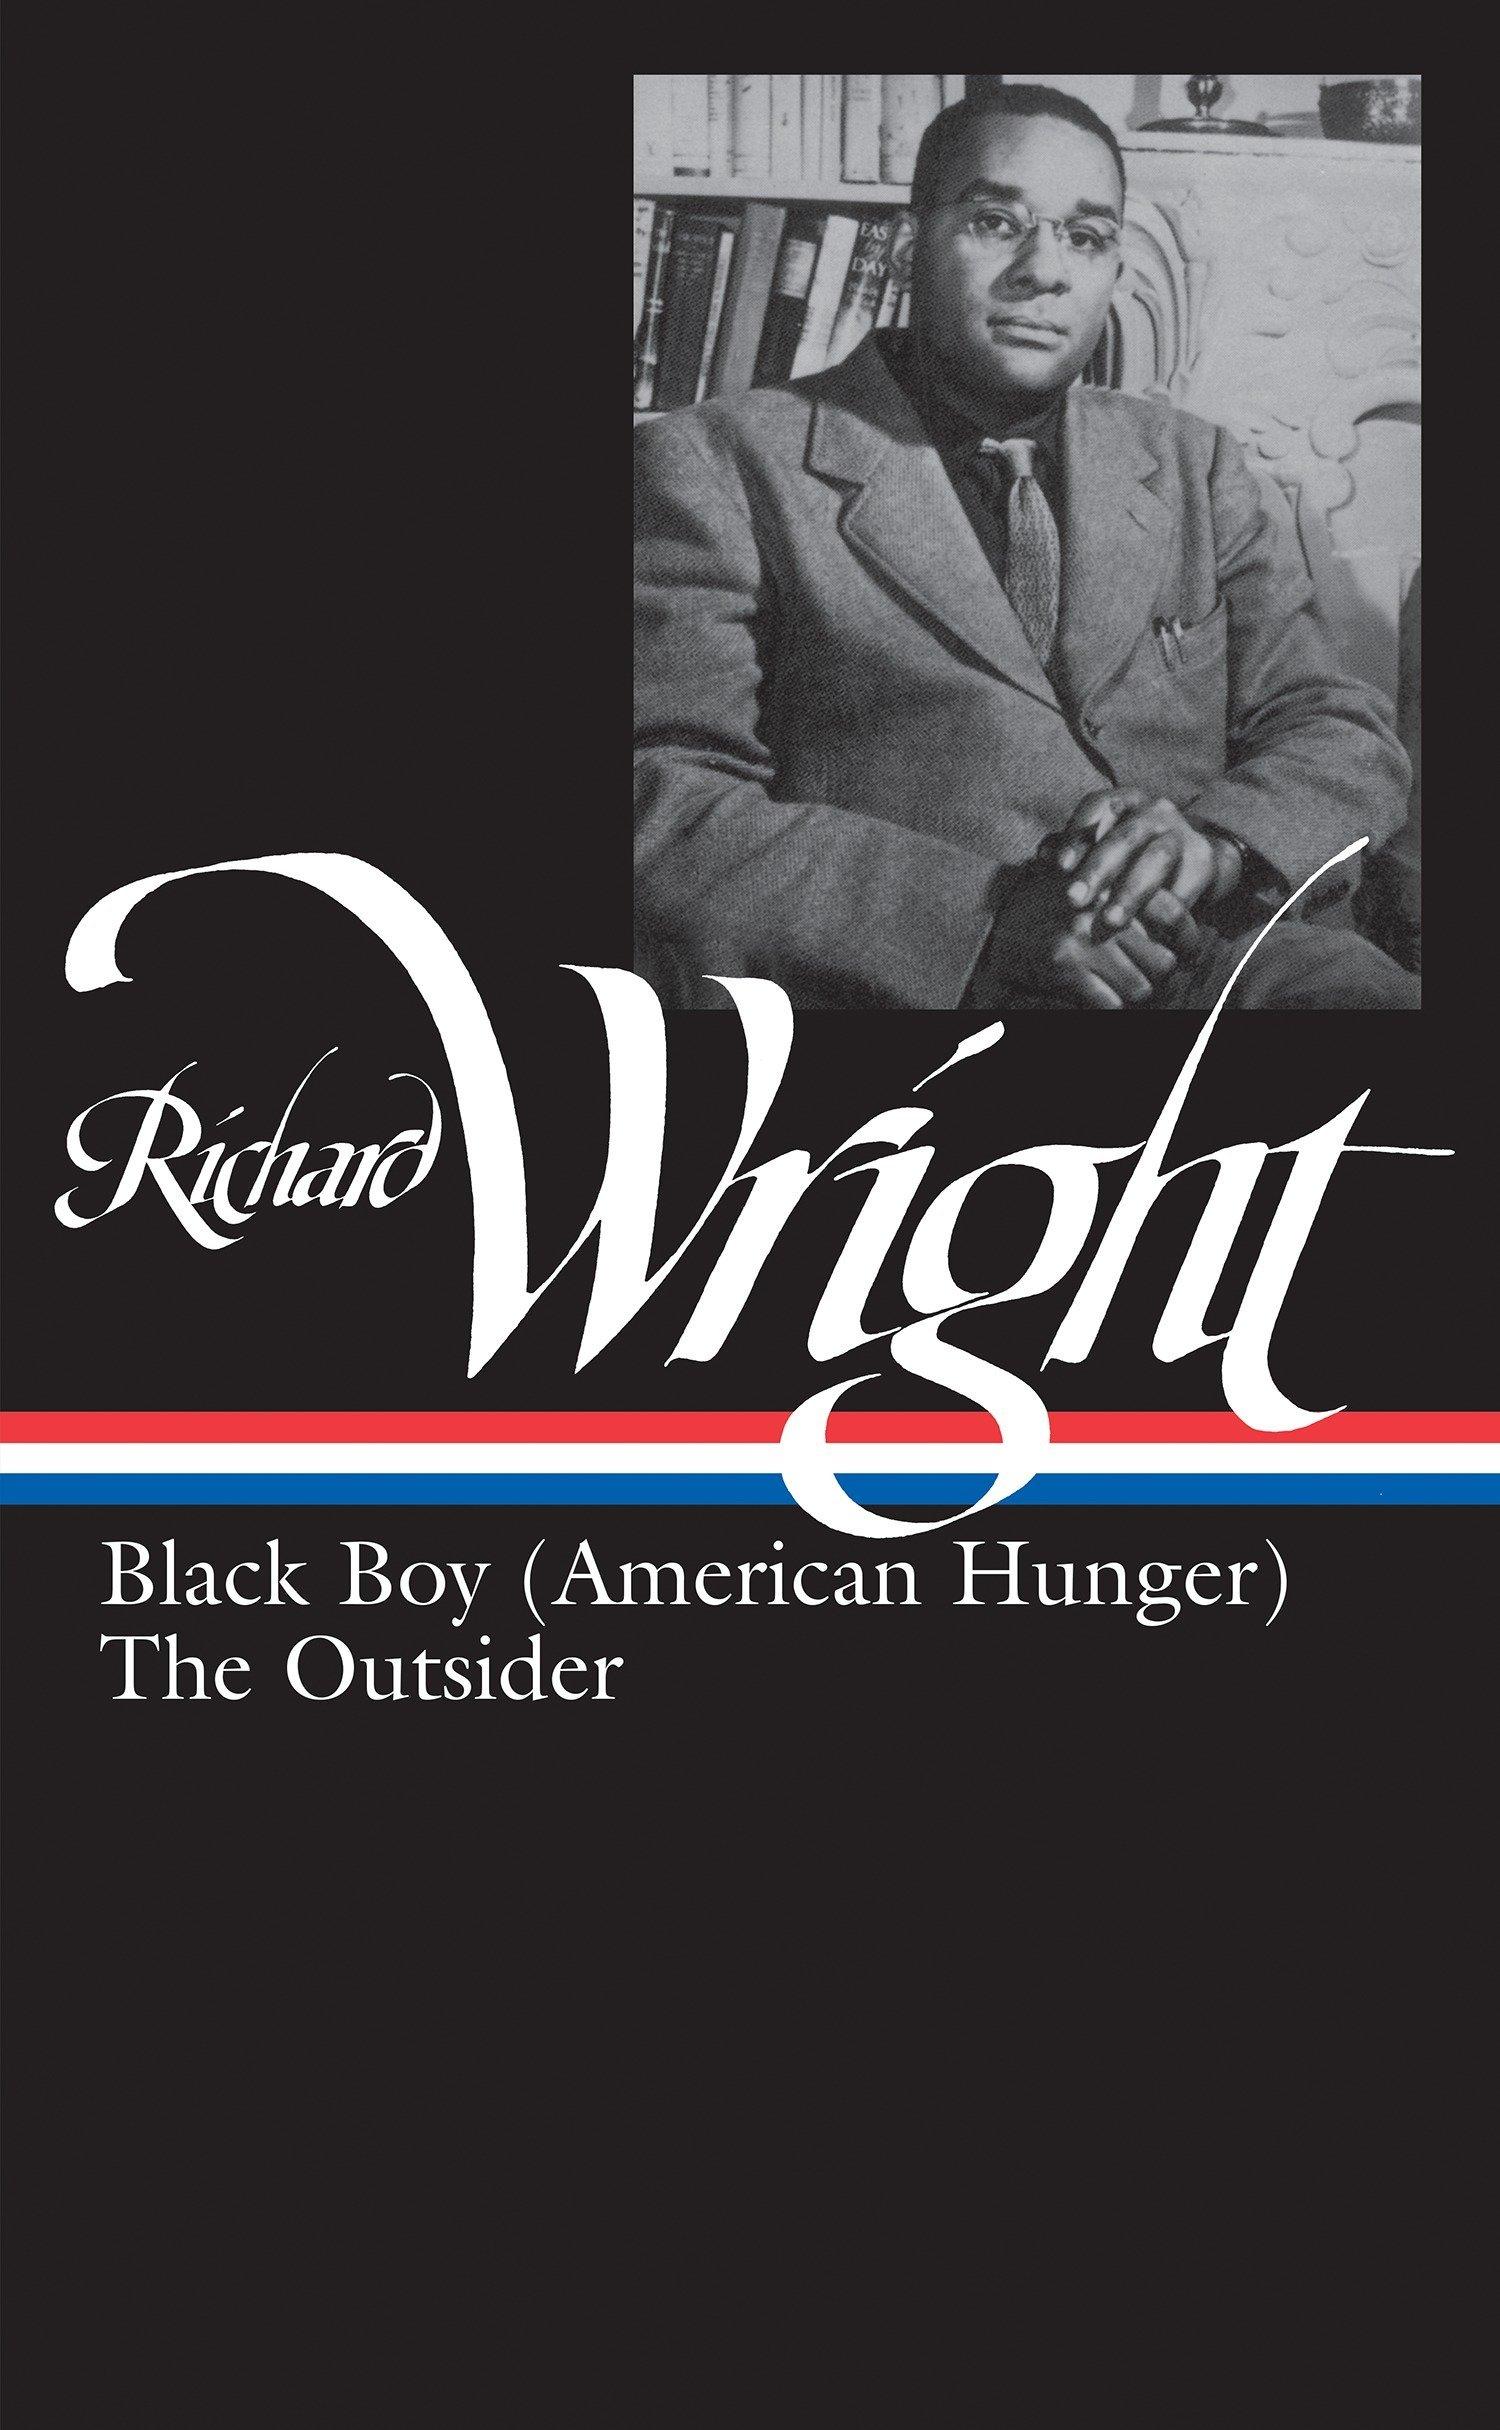 hunger in black boy